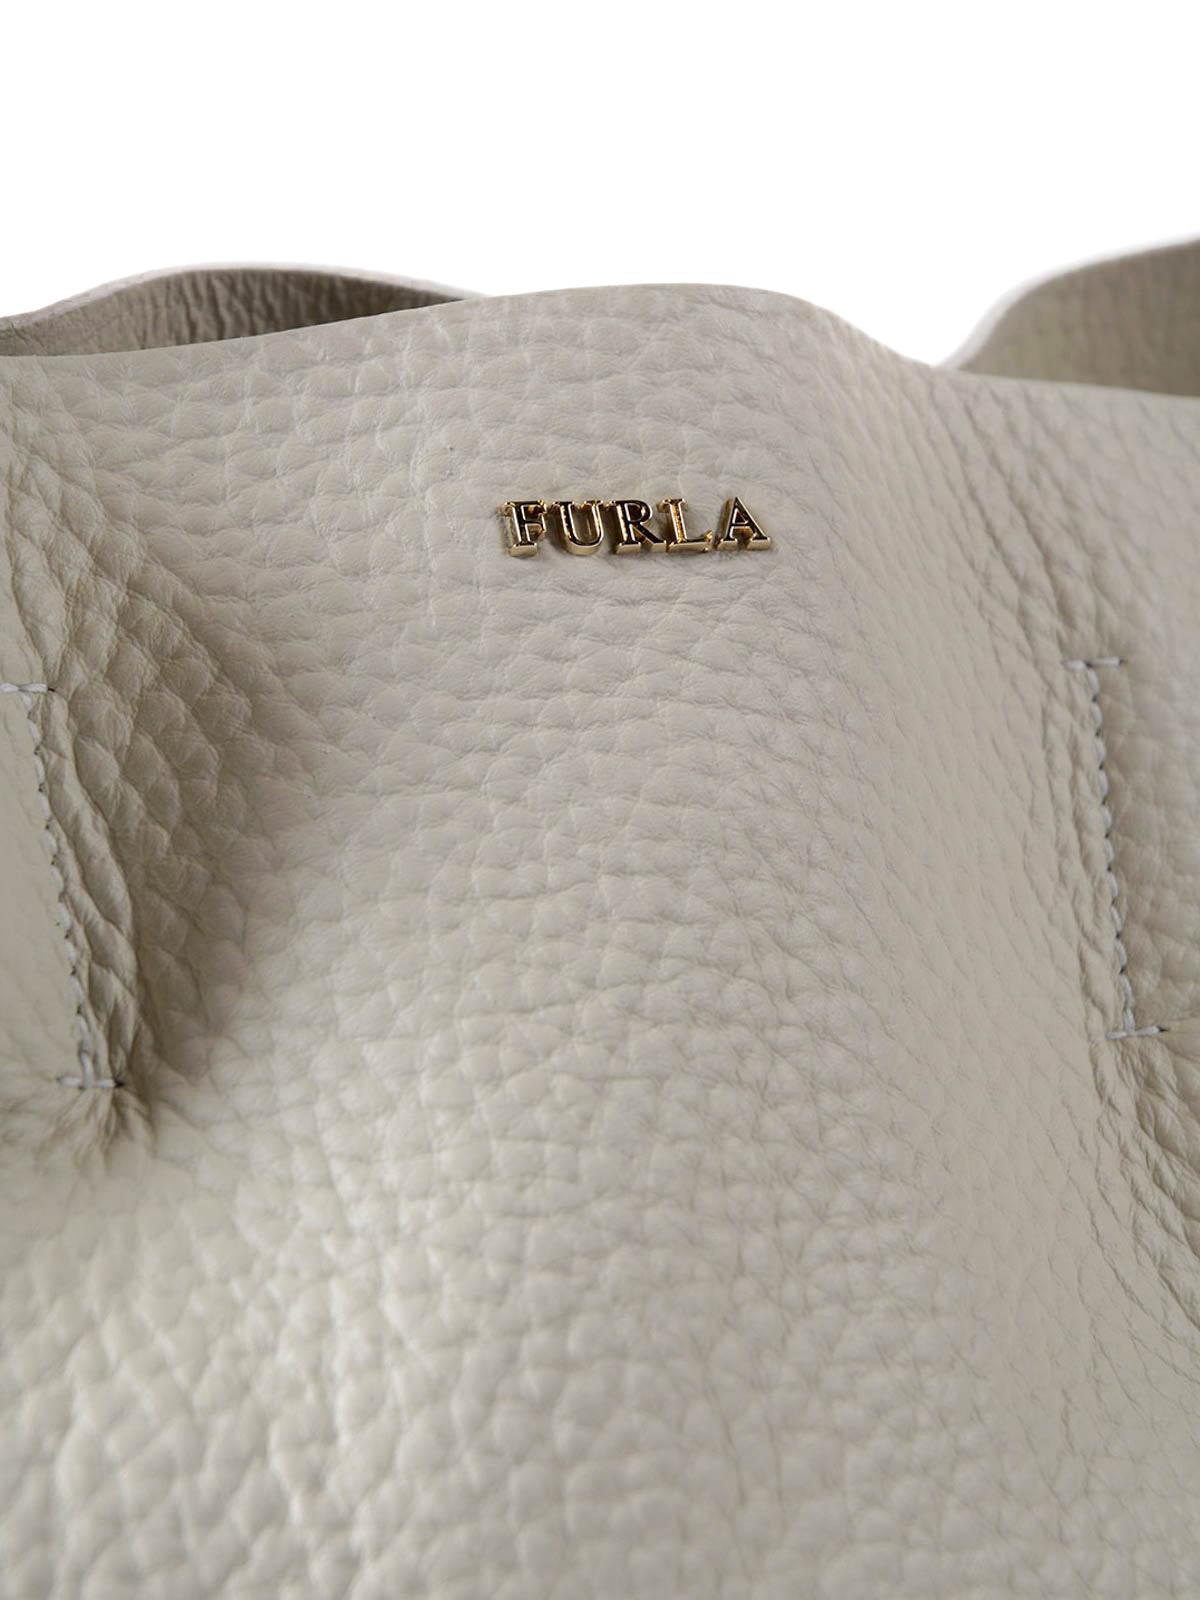 Furla Capriccio M White Leather Hobo Bag Shoulder Bags